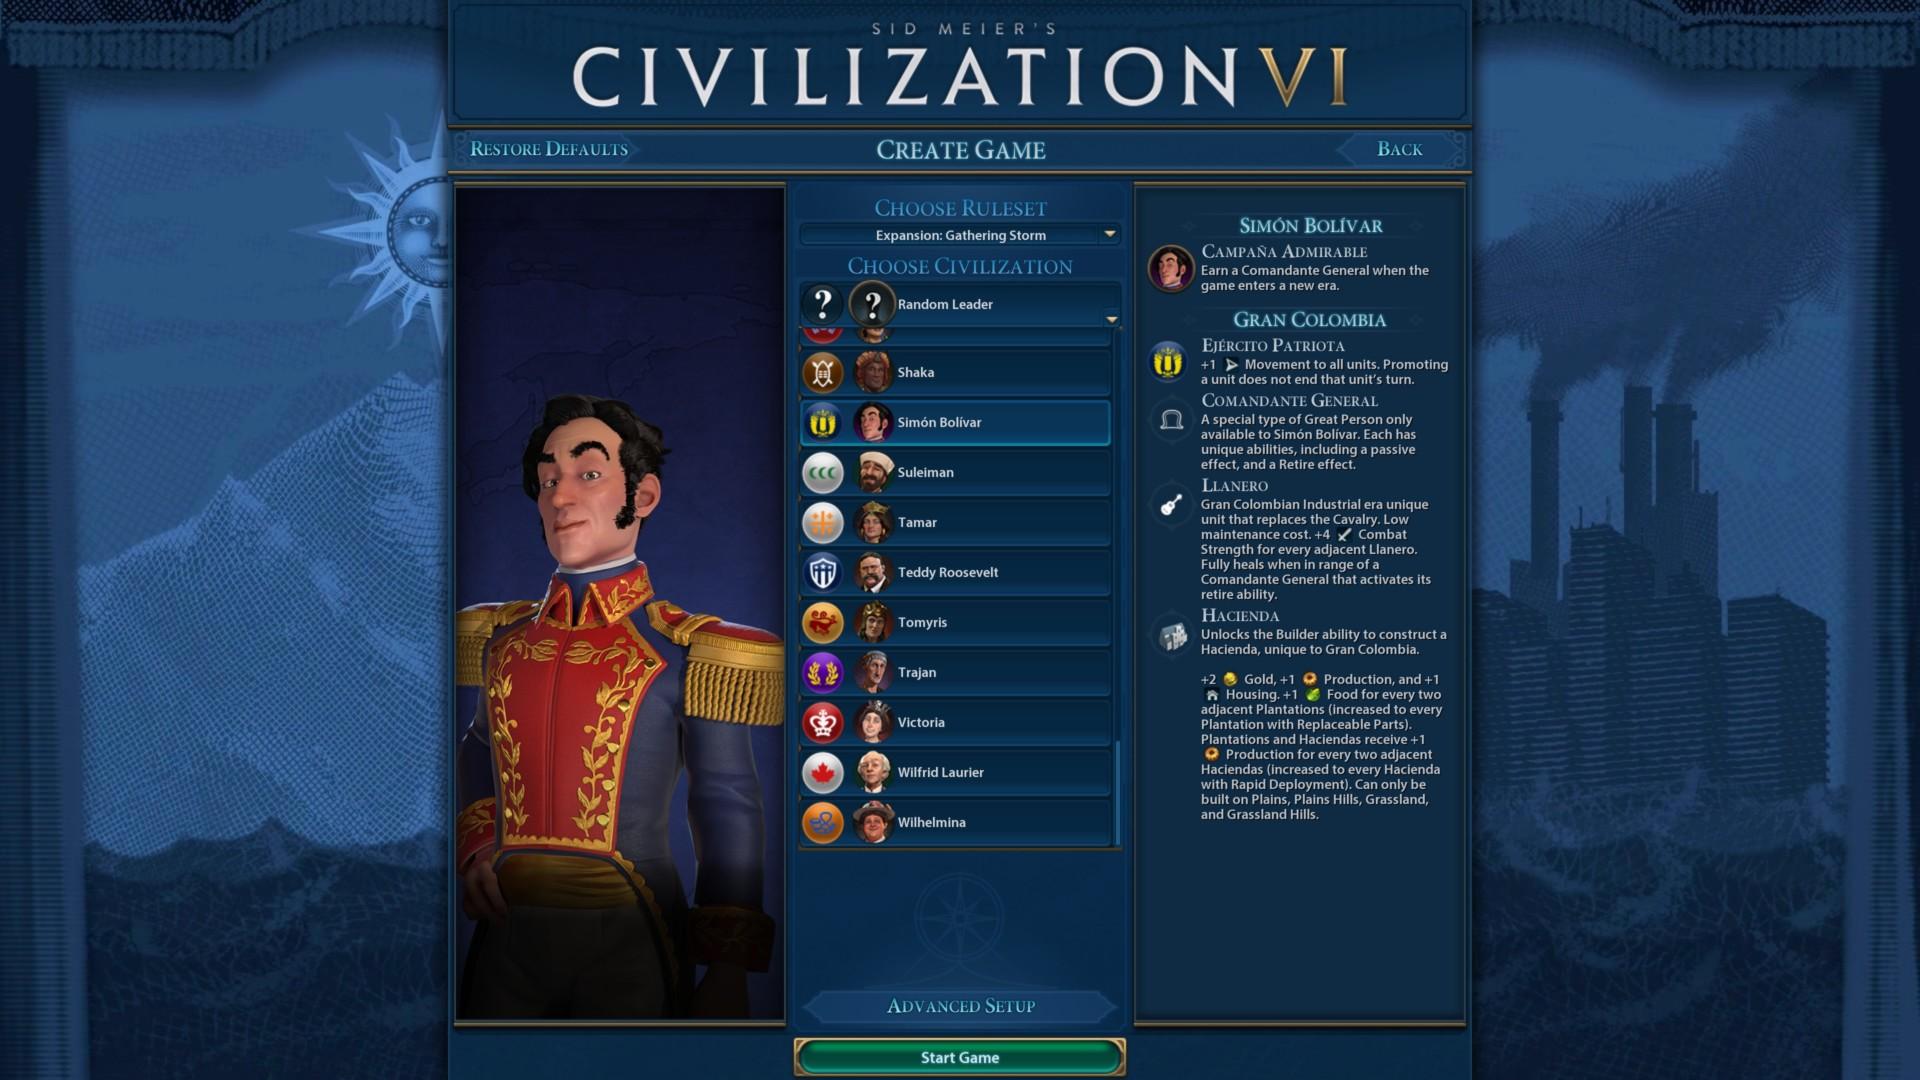 Playstation civilization